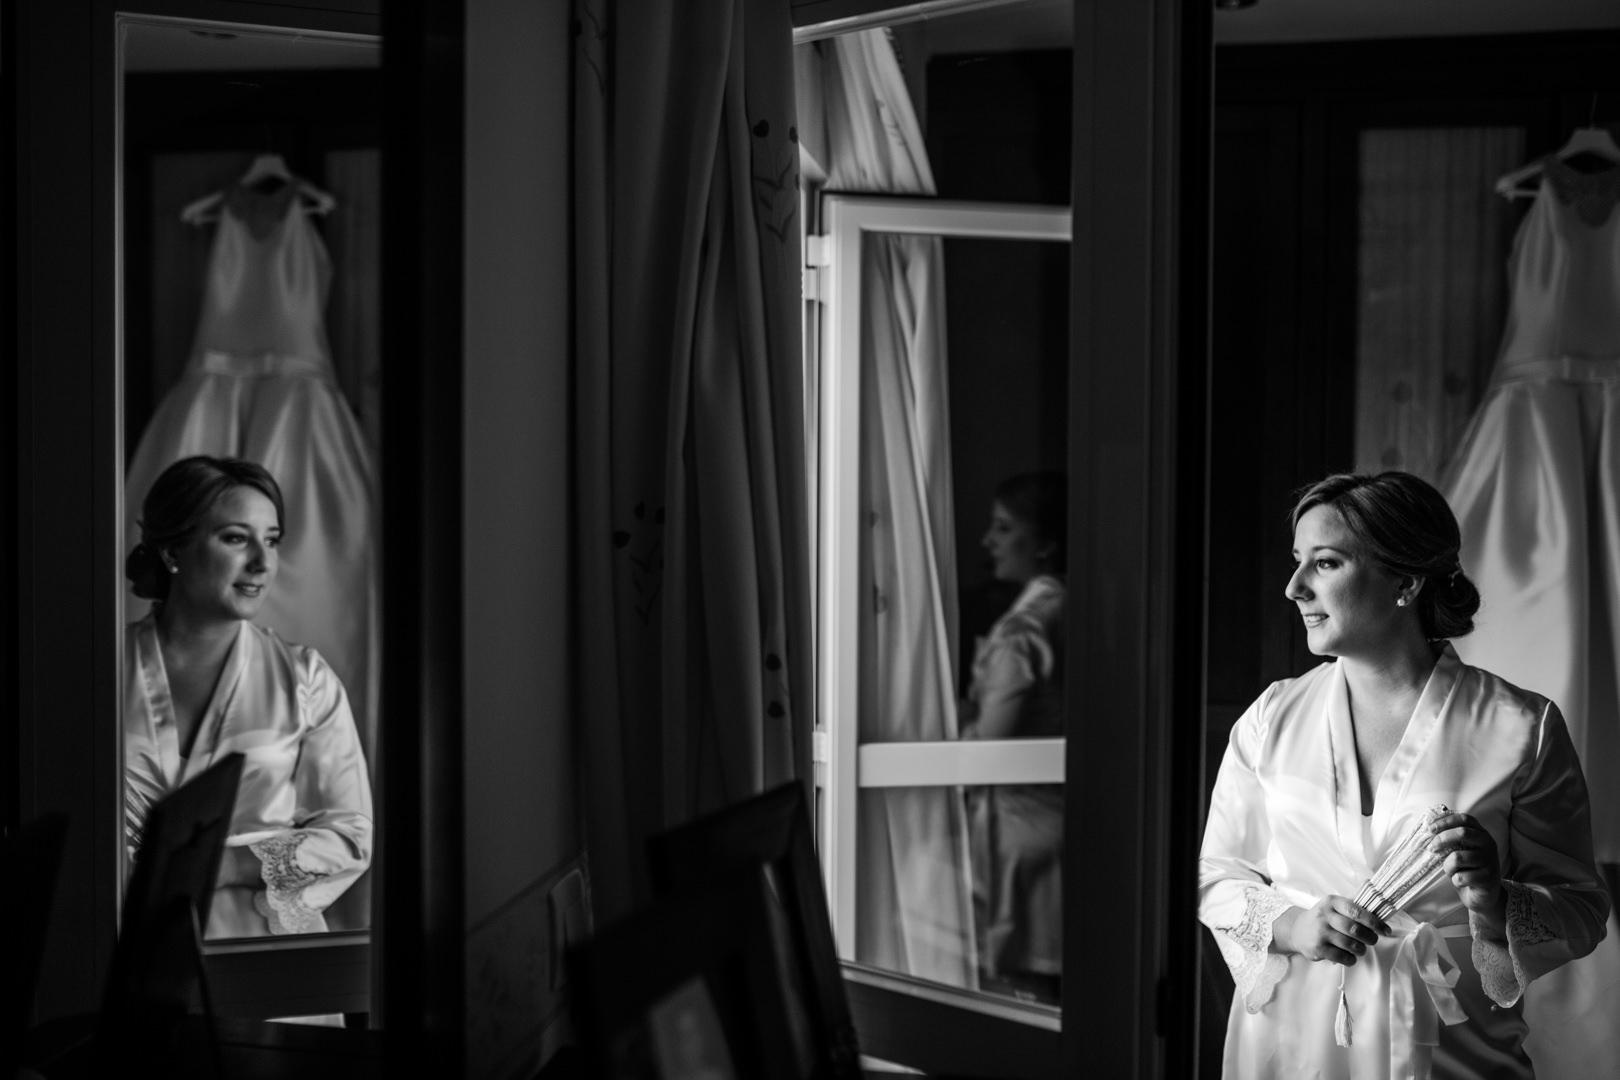 Boda-Catedral-Jaen-Hamburgo-Maria-David-engagement-Rafael-Torres-fotografo-bodas-sevilla-madrid-barcelona-wedding-photographer--10.jpg